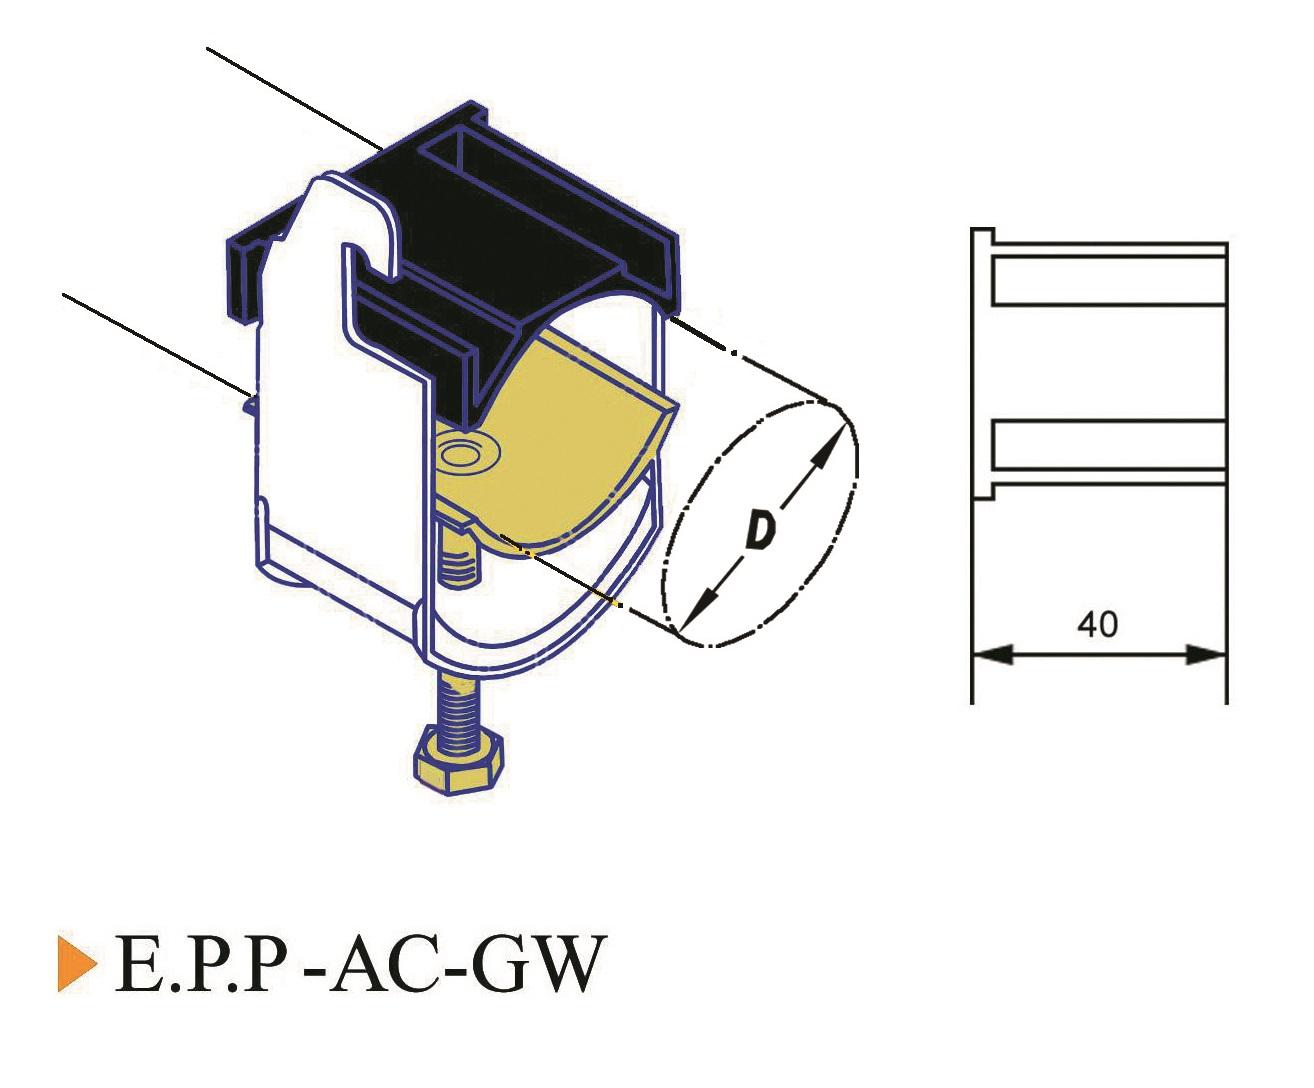 E.P.P-AC-Gw Cable Clamp